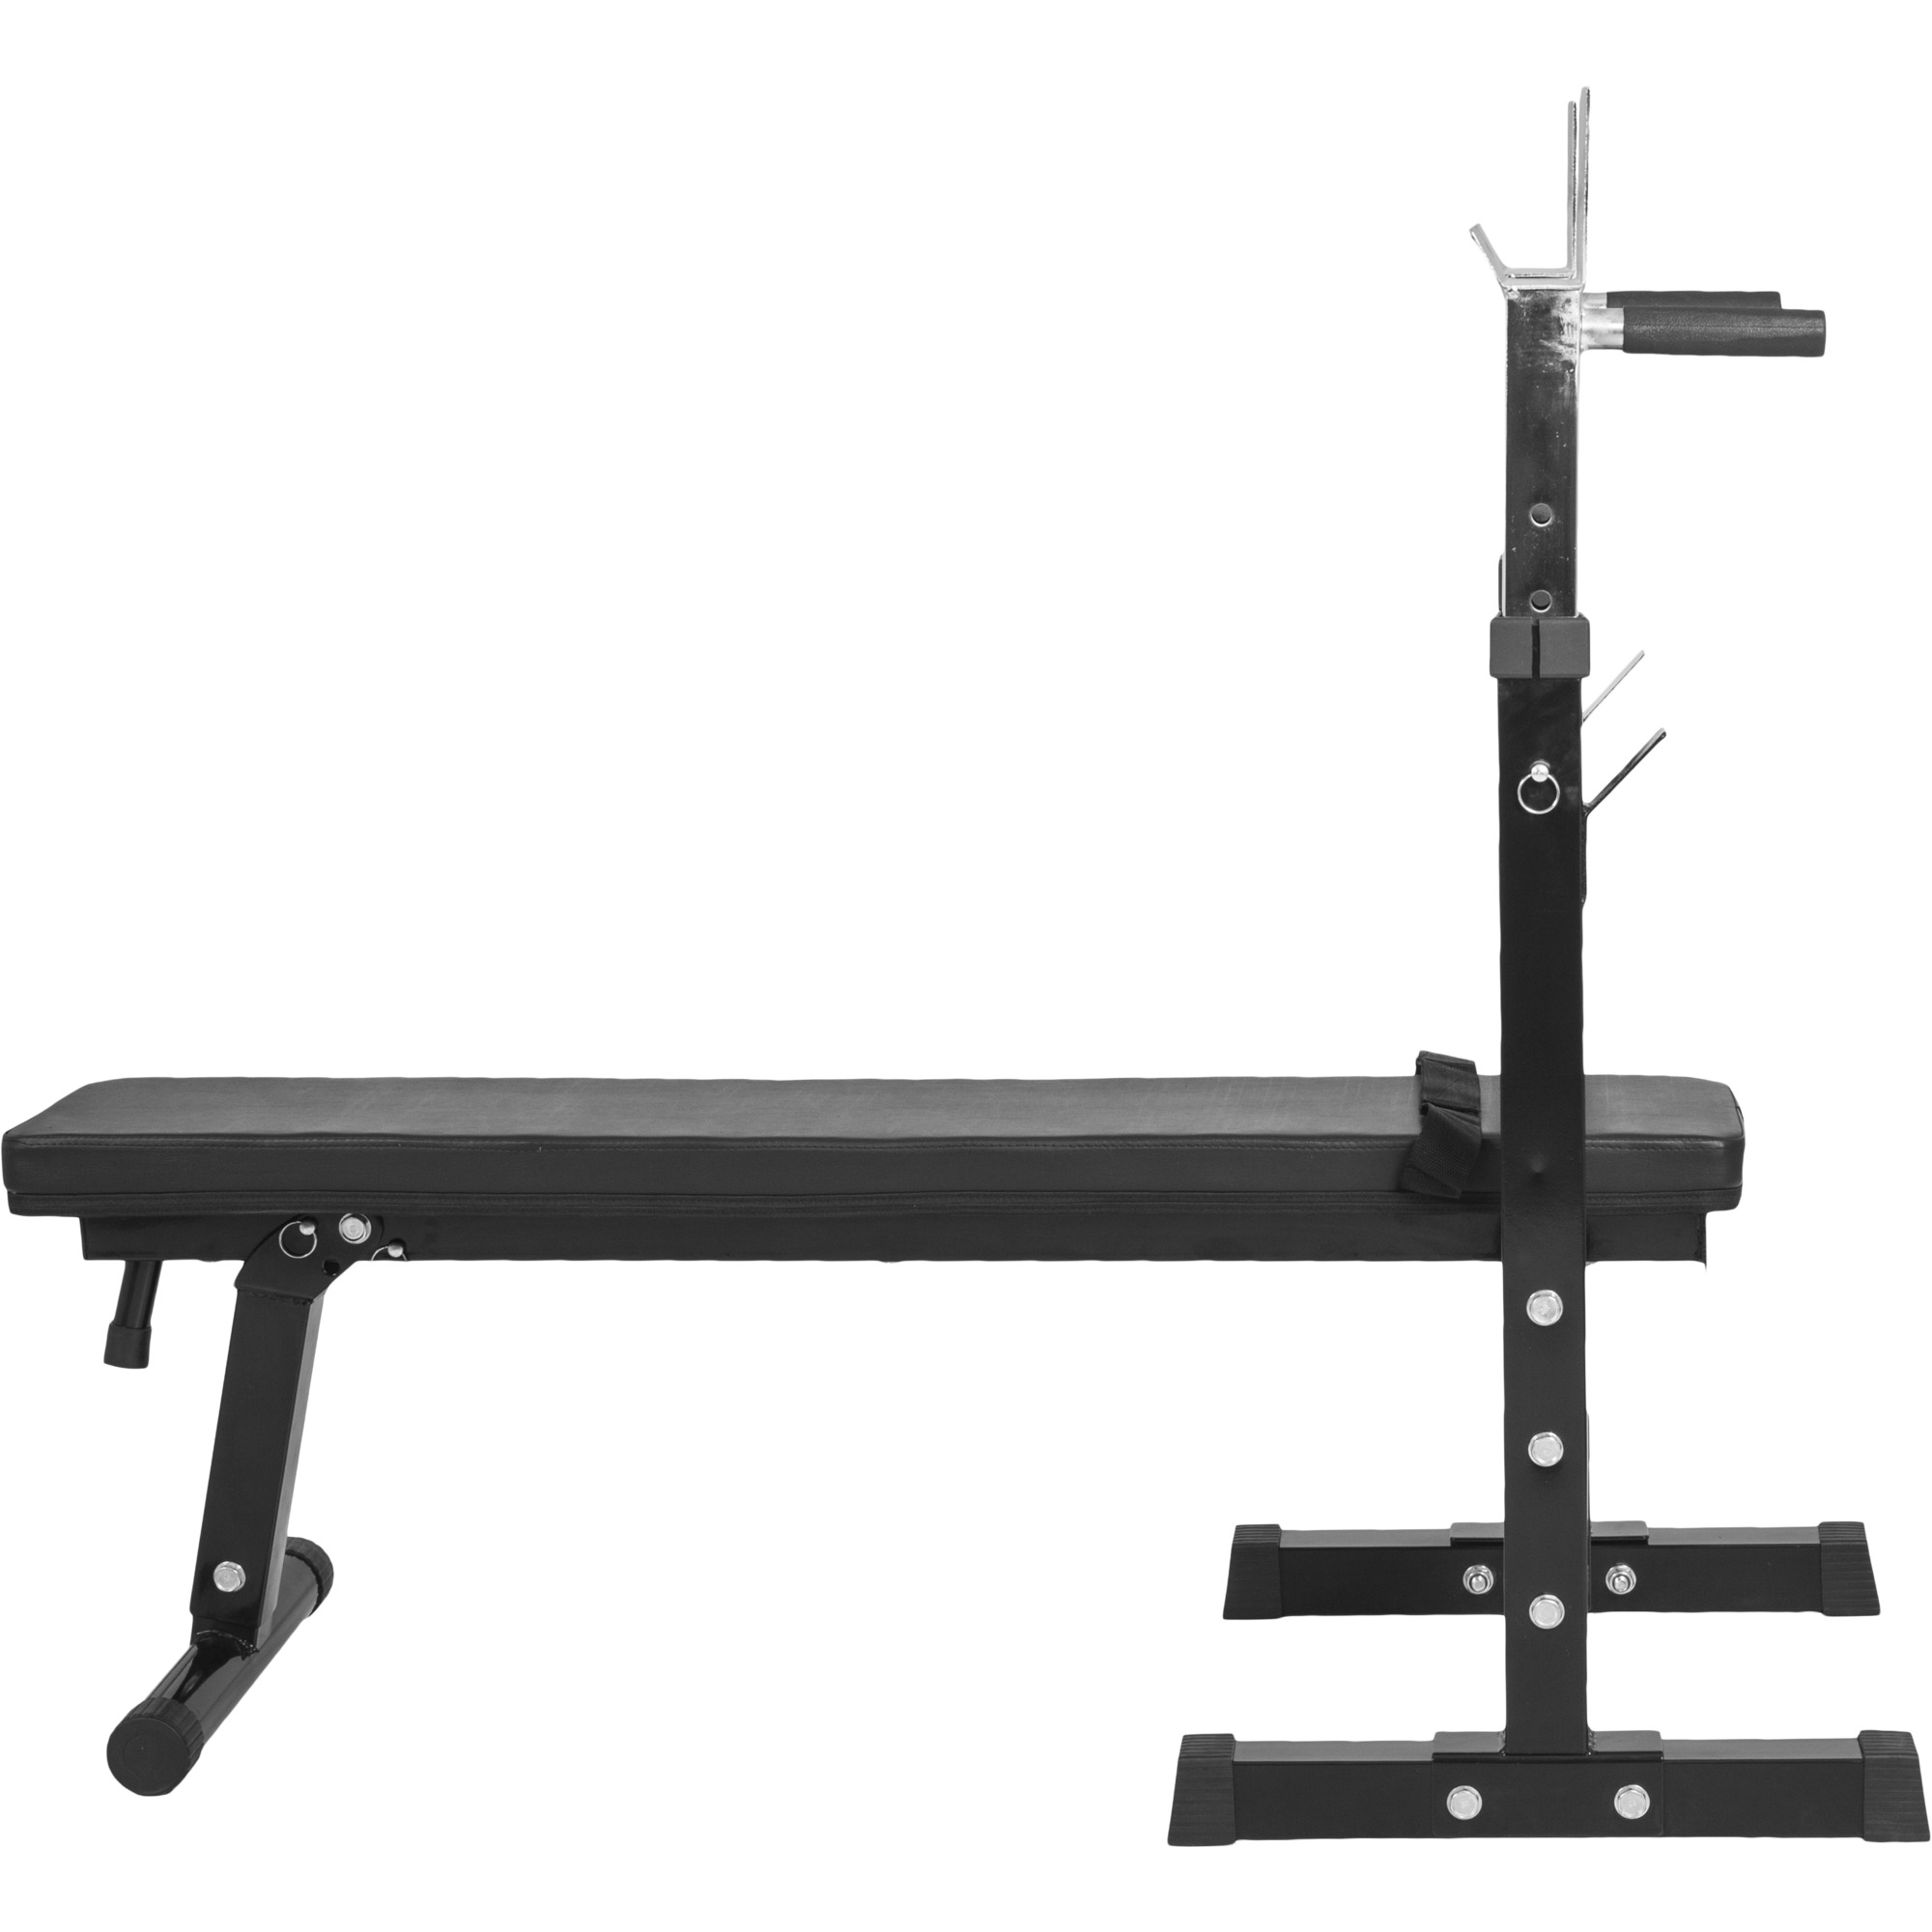 banc de musculation avec support de barres gs006 noir press benchbm 222. Black Bedroom Furniture Sets. Home Design Ideas